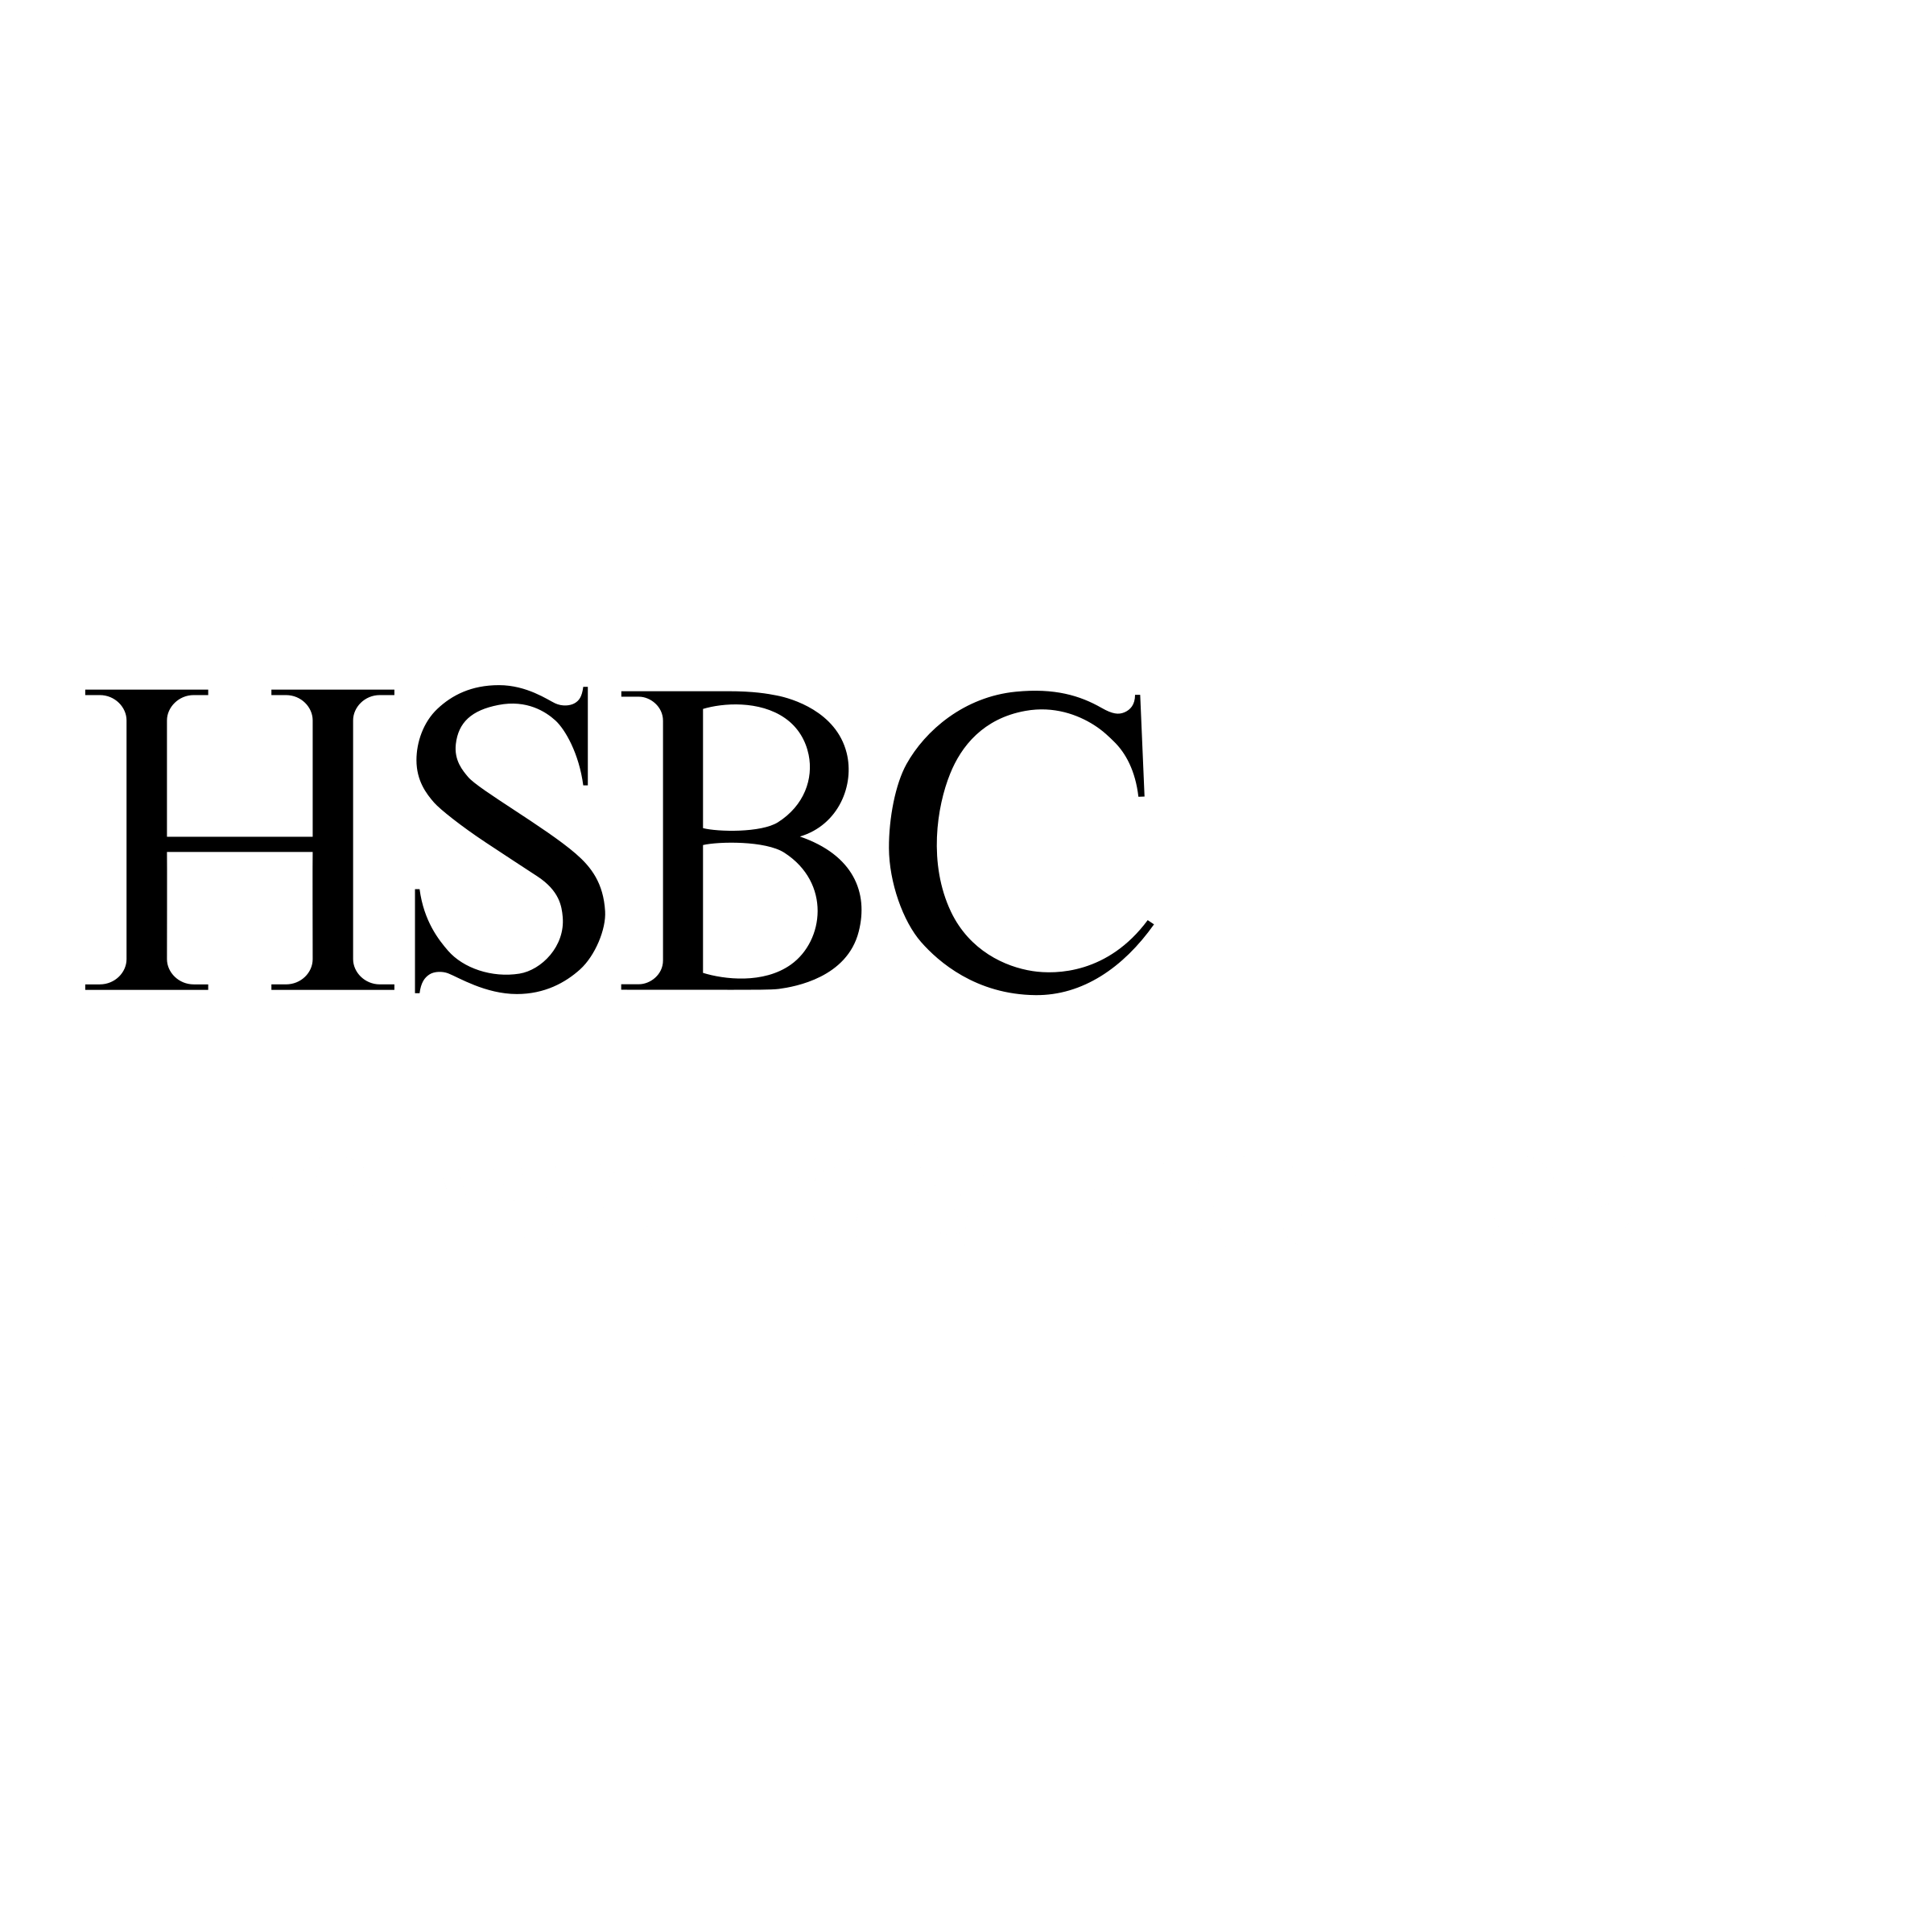 HSBC Logo Black And White